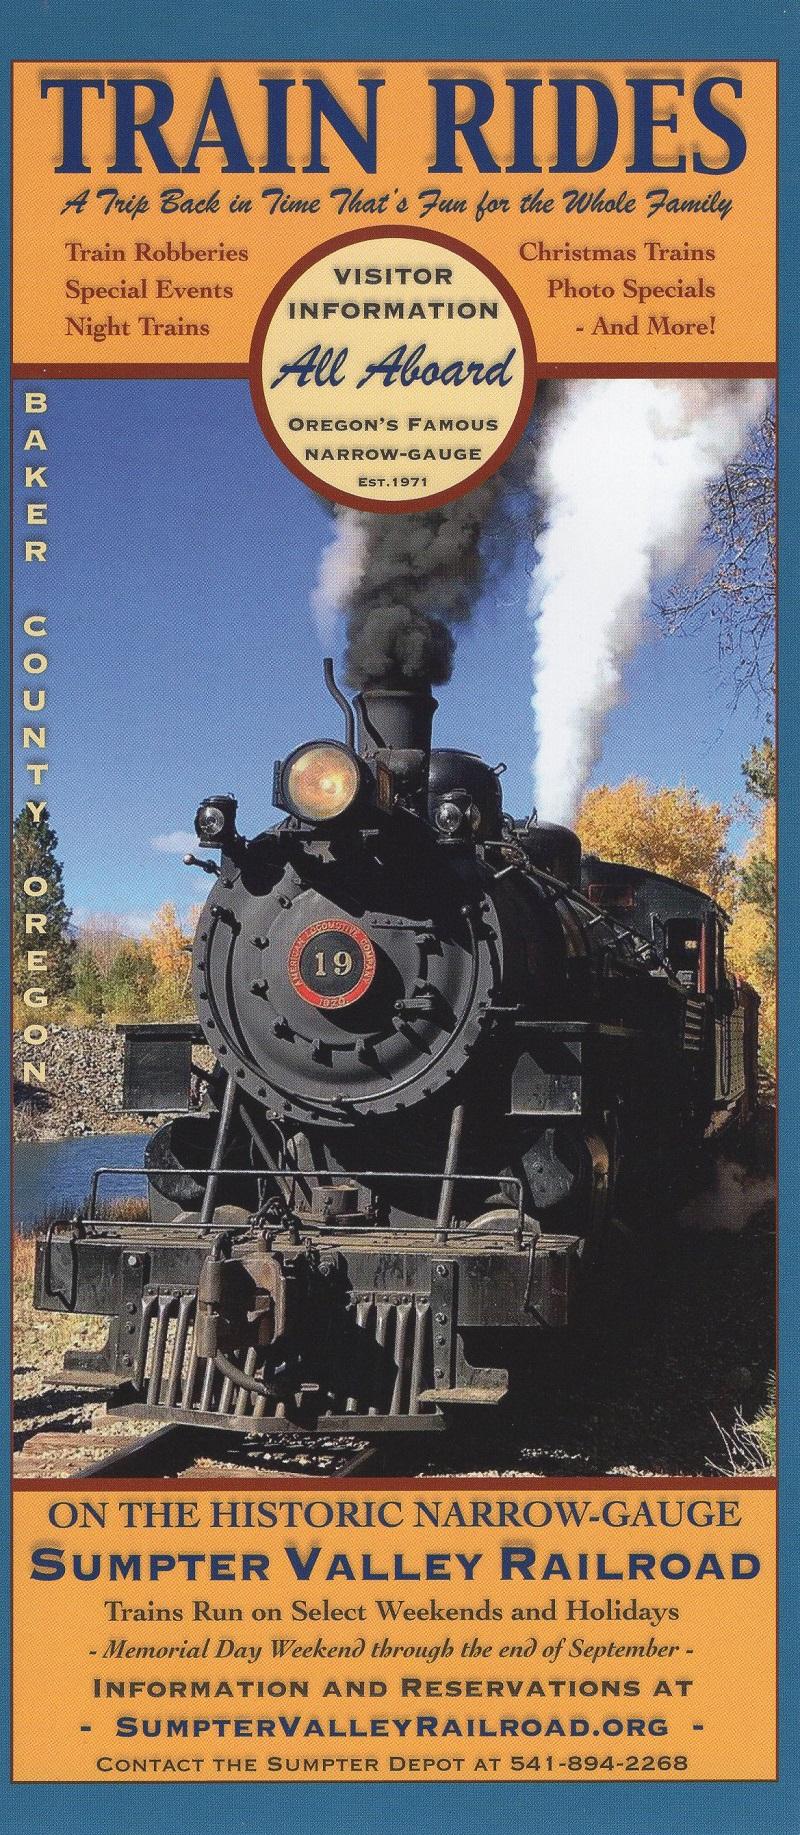 Sumpter Valley Railroad